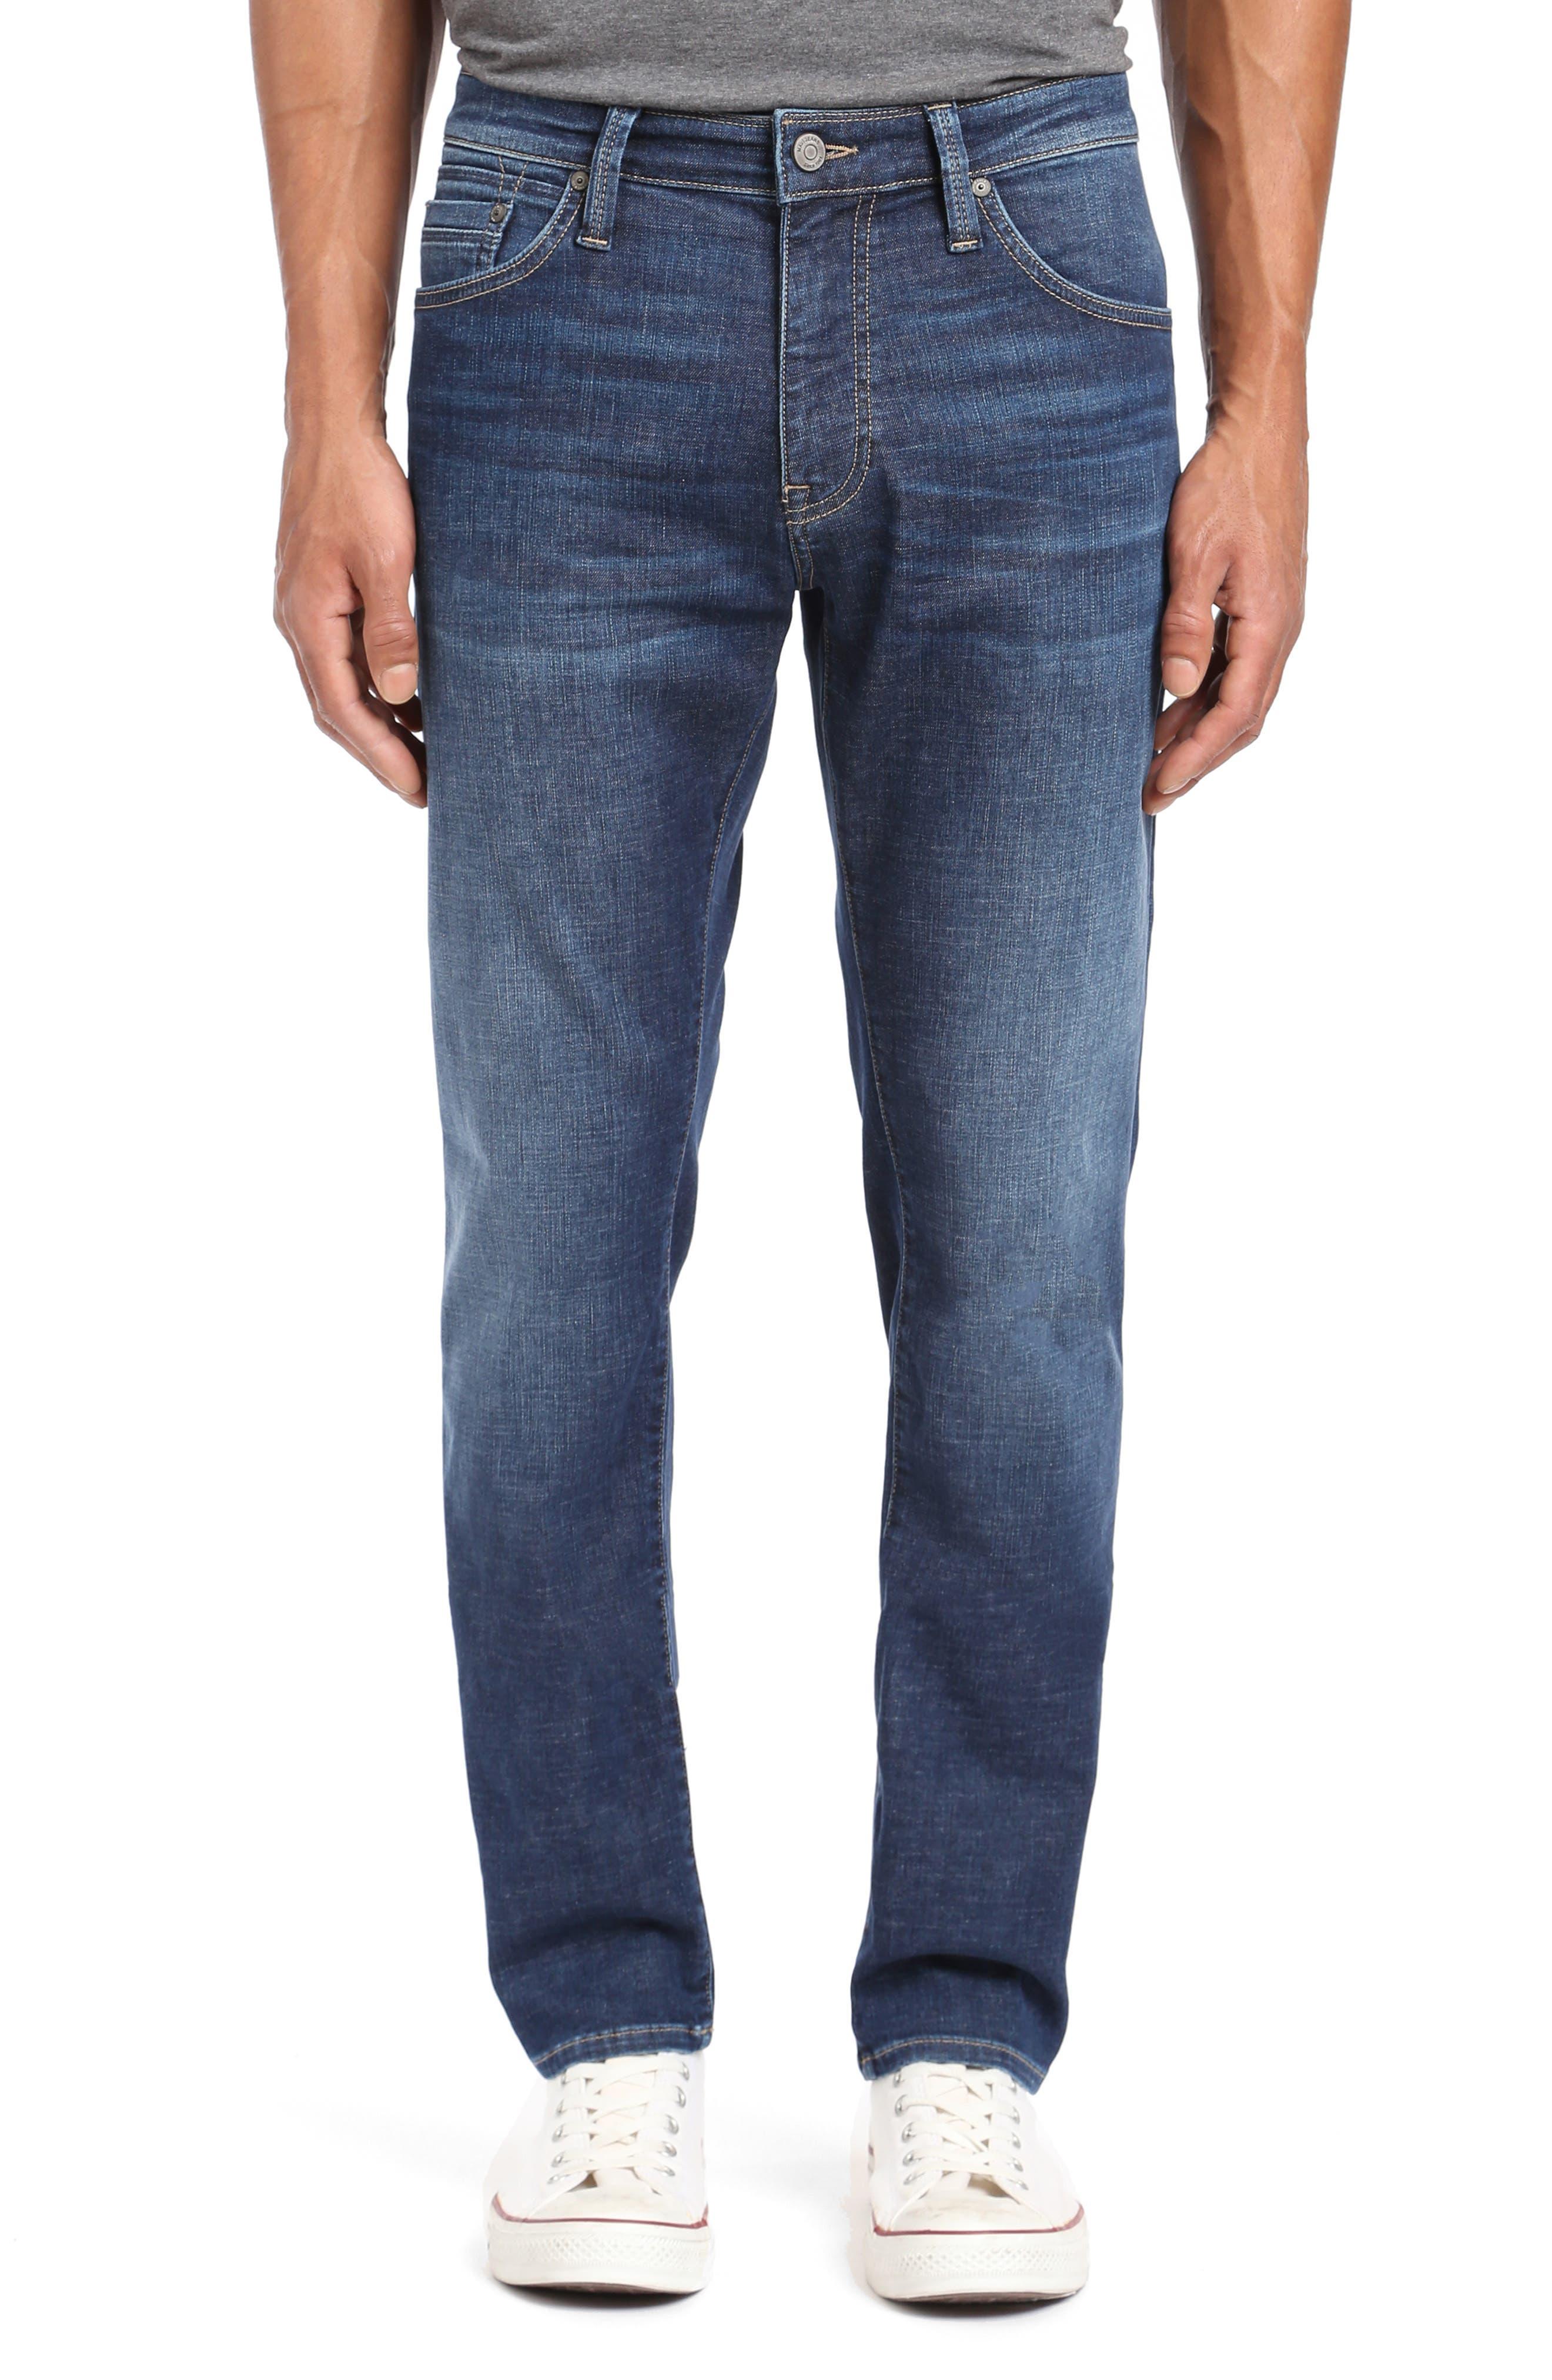 Jake Slim Fit Jeans,                             Main thumbnail 1, color,                             DARK BRUSHED CASHMERE